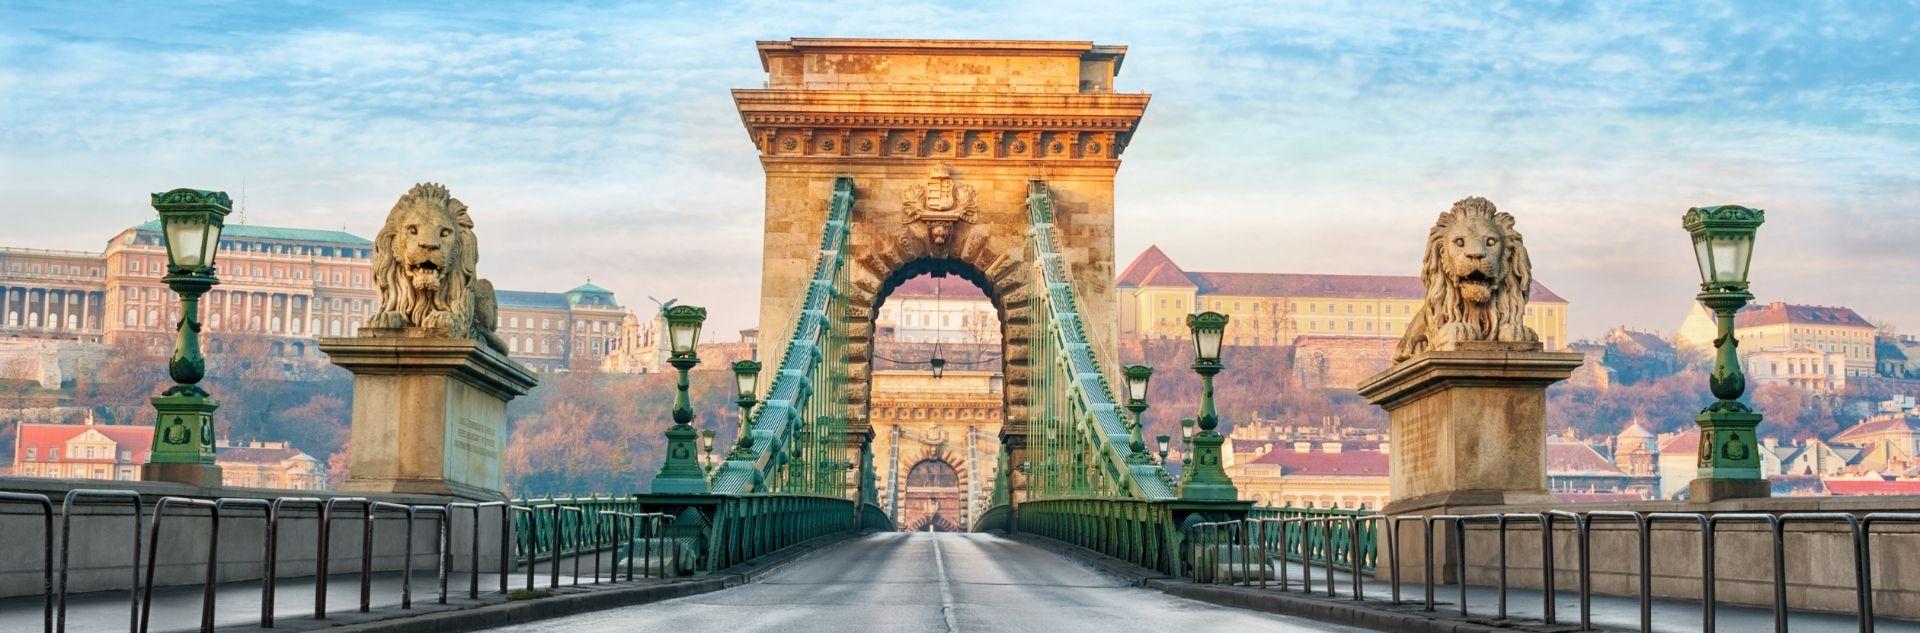 Budapest leere Brücke